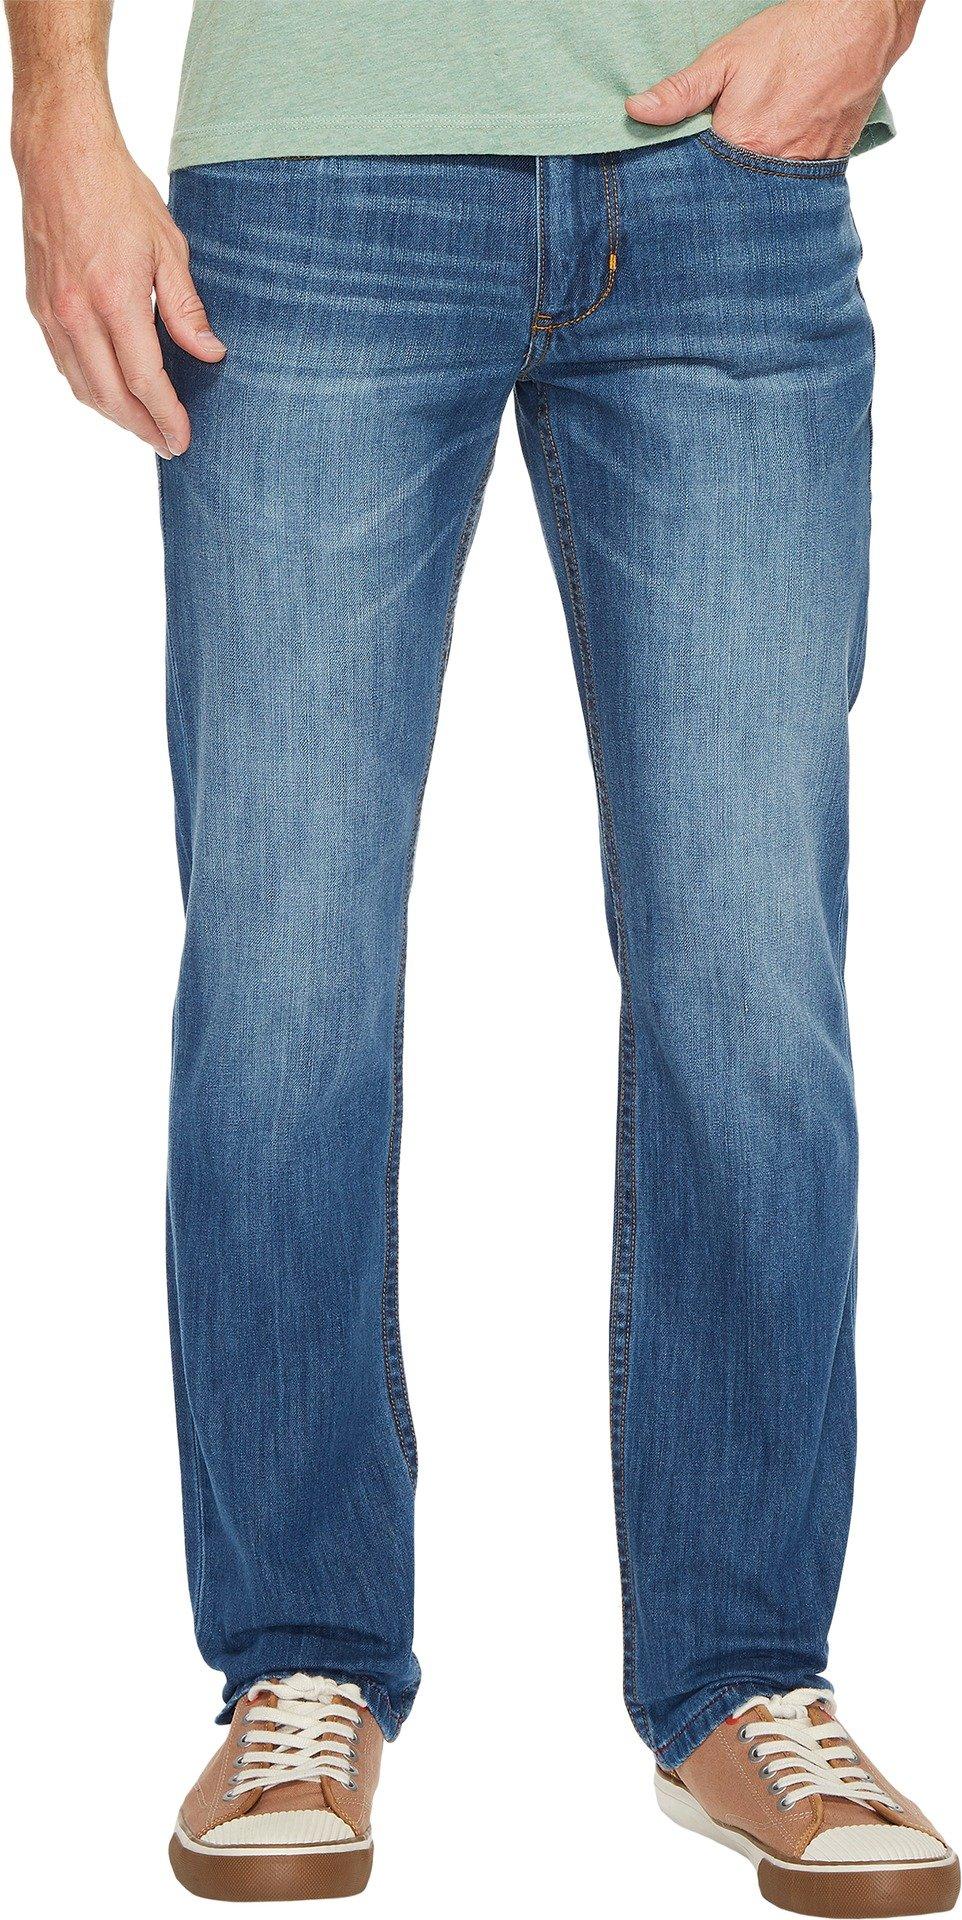 Tommy Bahama Men's Barbados Vintage Fit Jeans Light Indigo Wash 40W x 30L